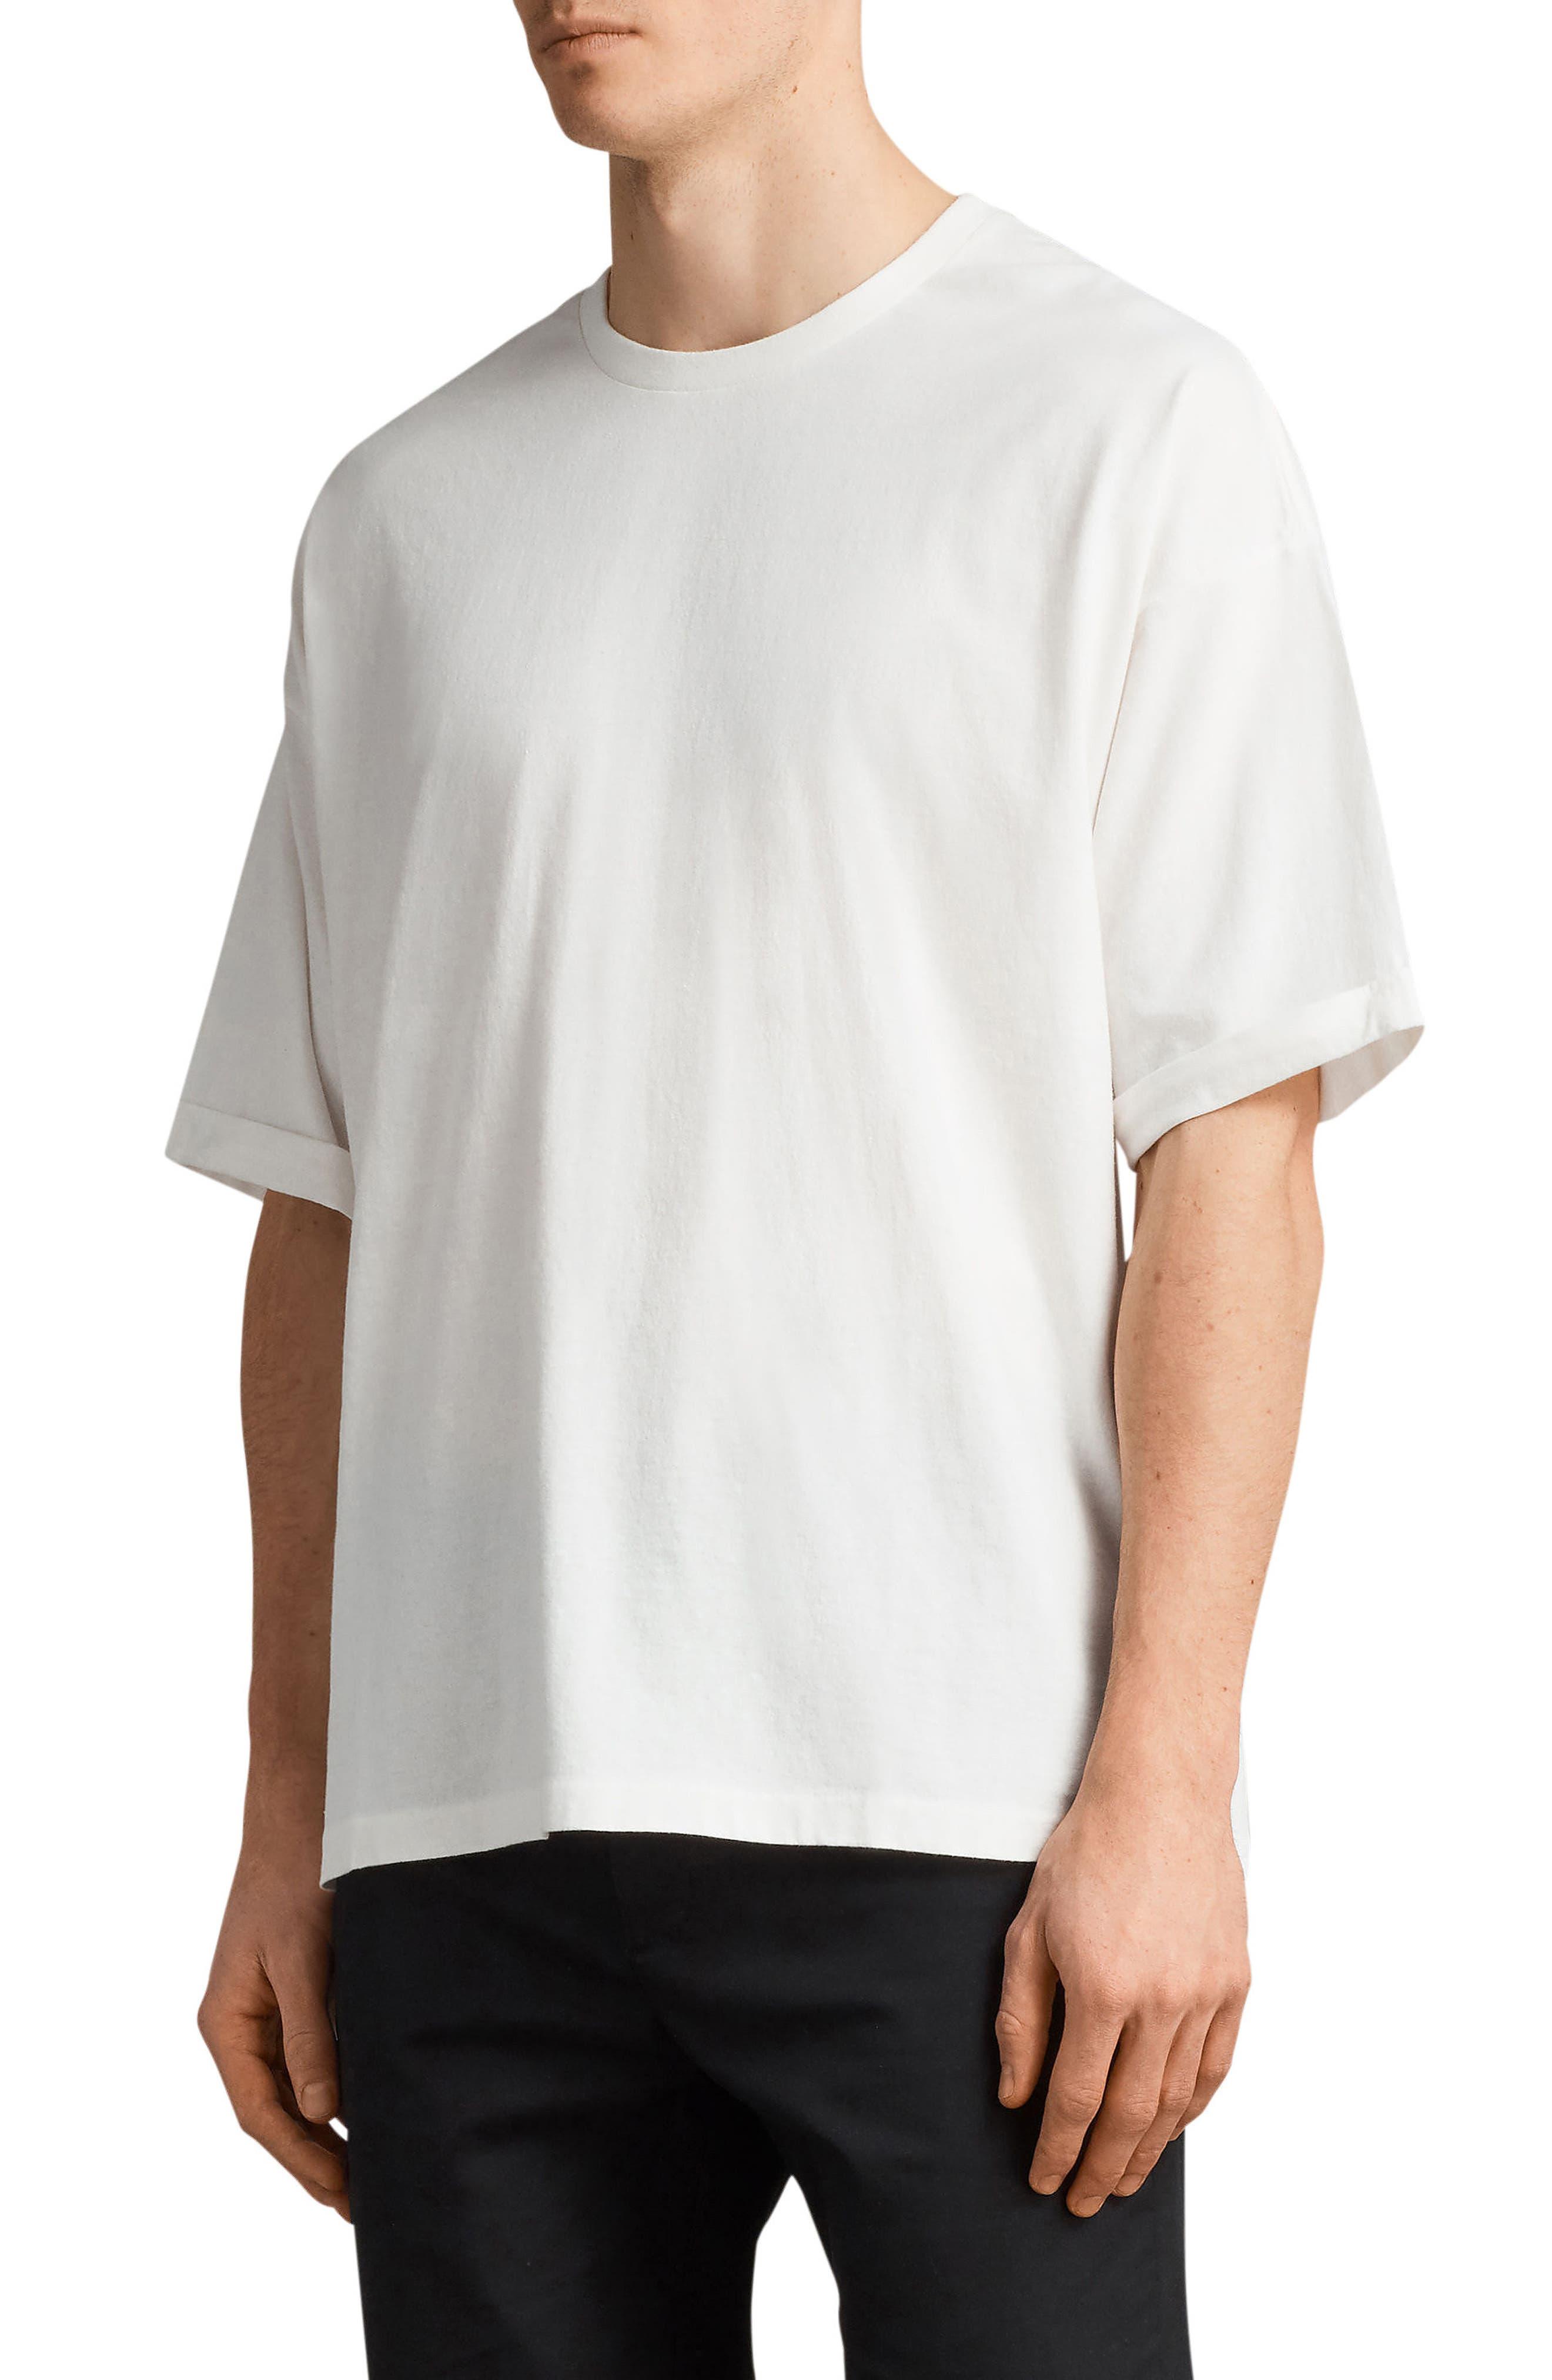 Kleeve Oversized Crewneck T-Shirt,                             Alternate thumbnail 3, color,                             Chalk Marl